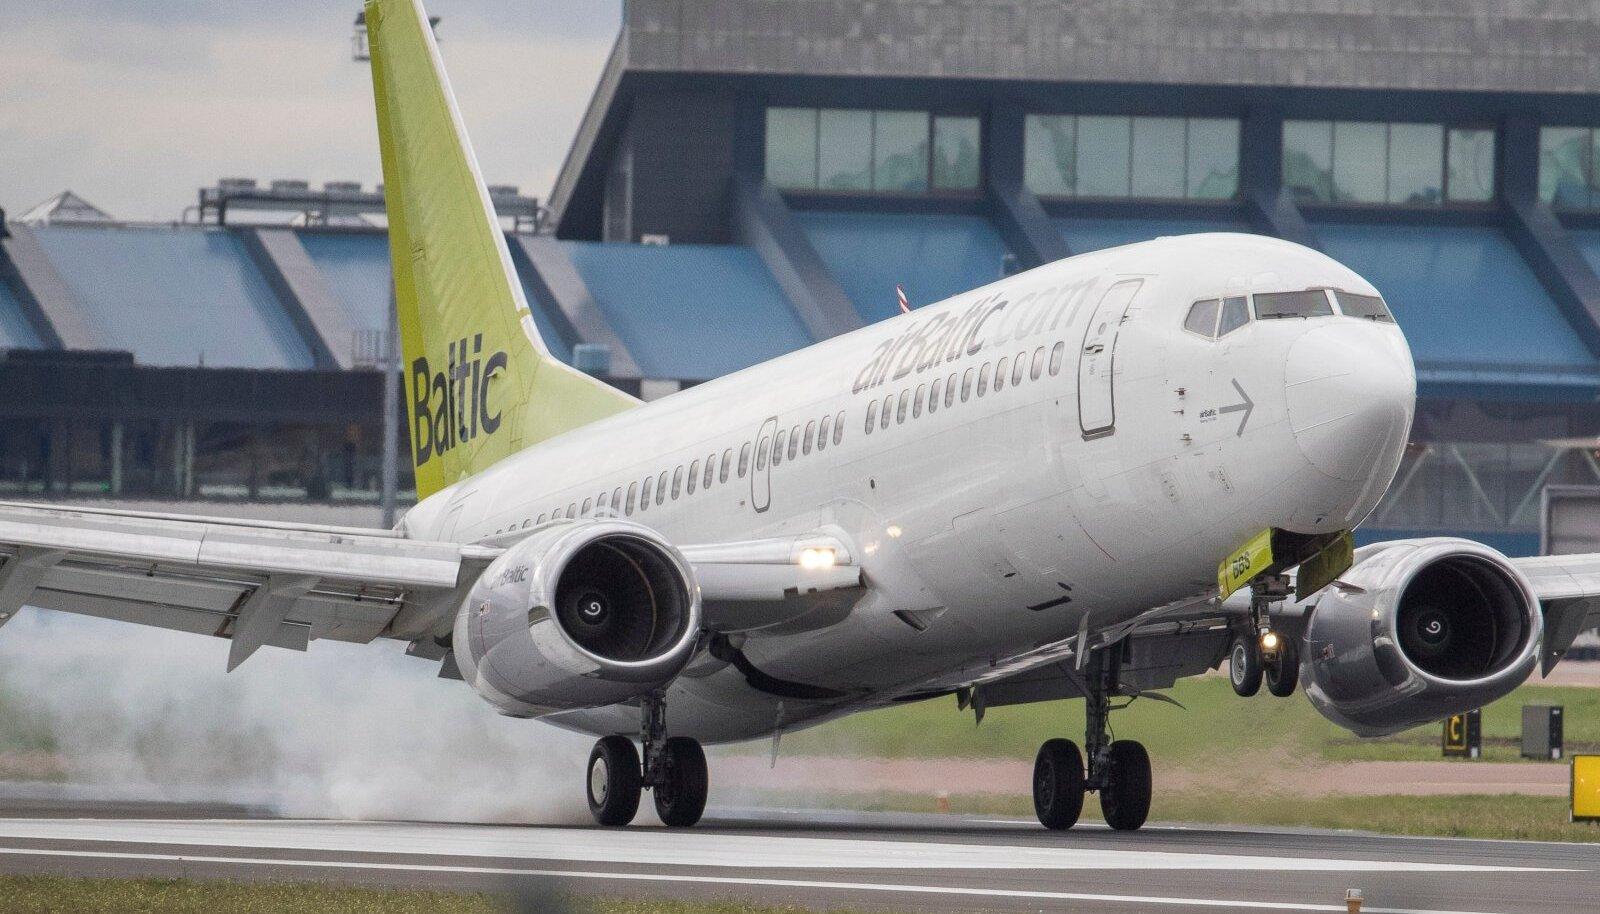 Lennuk Tallinna lennuväljal